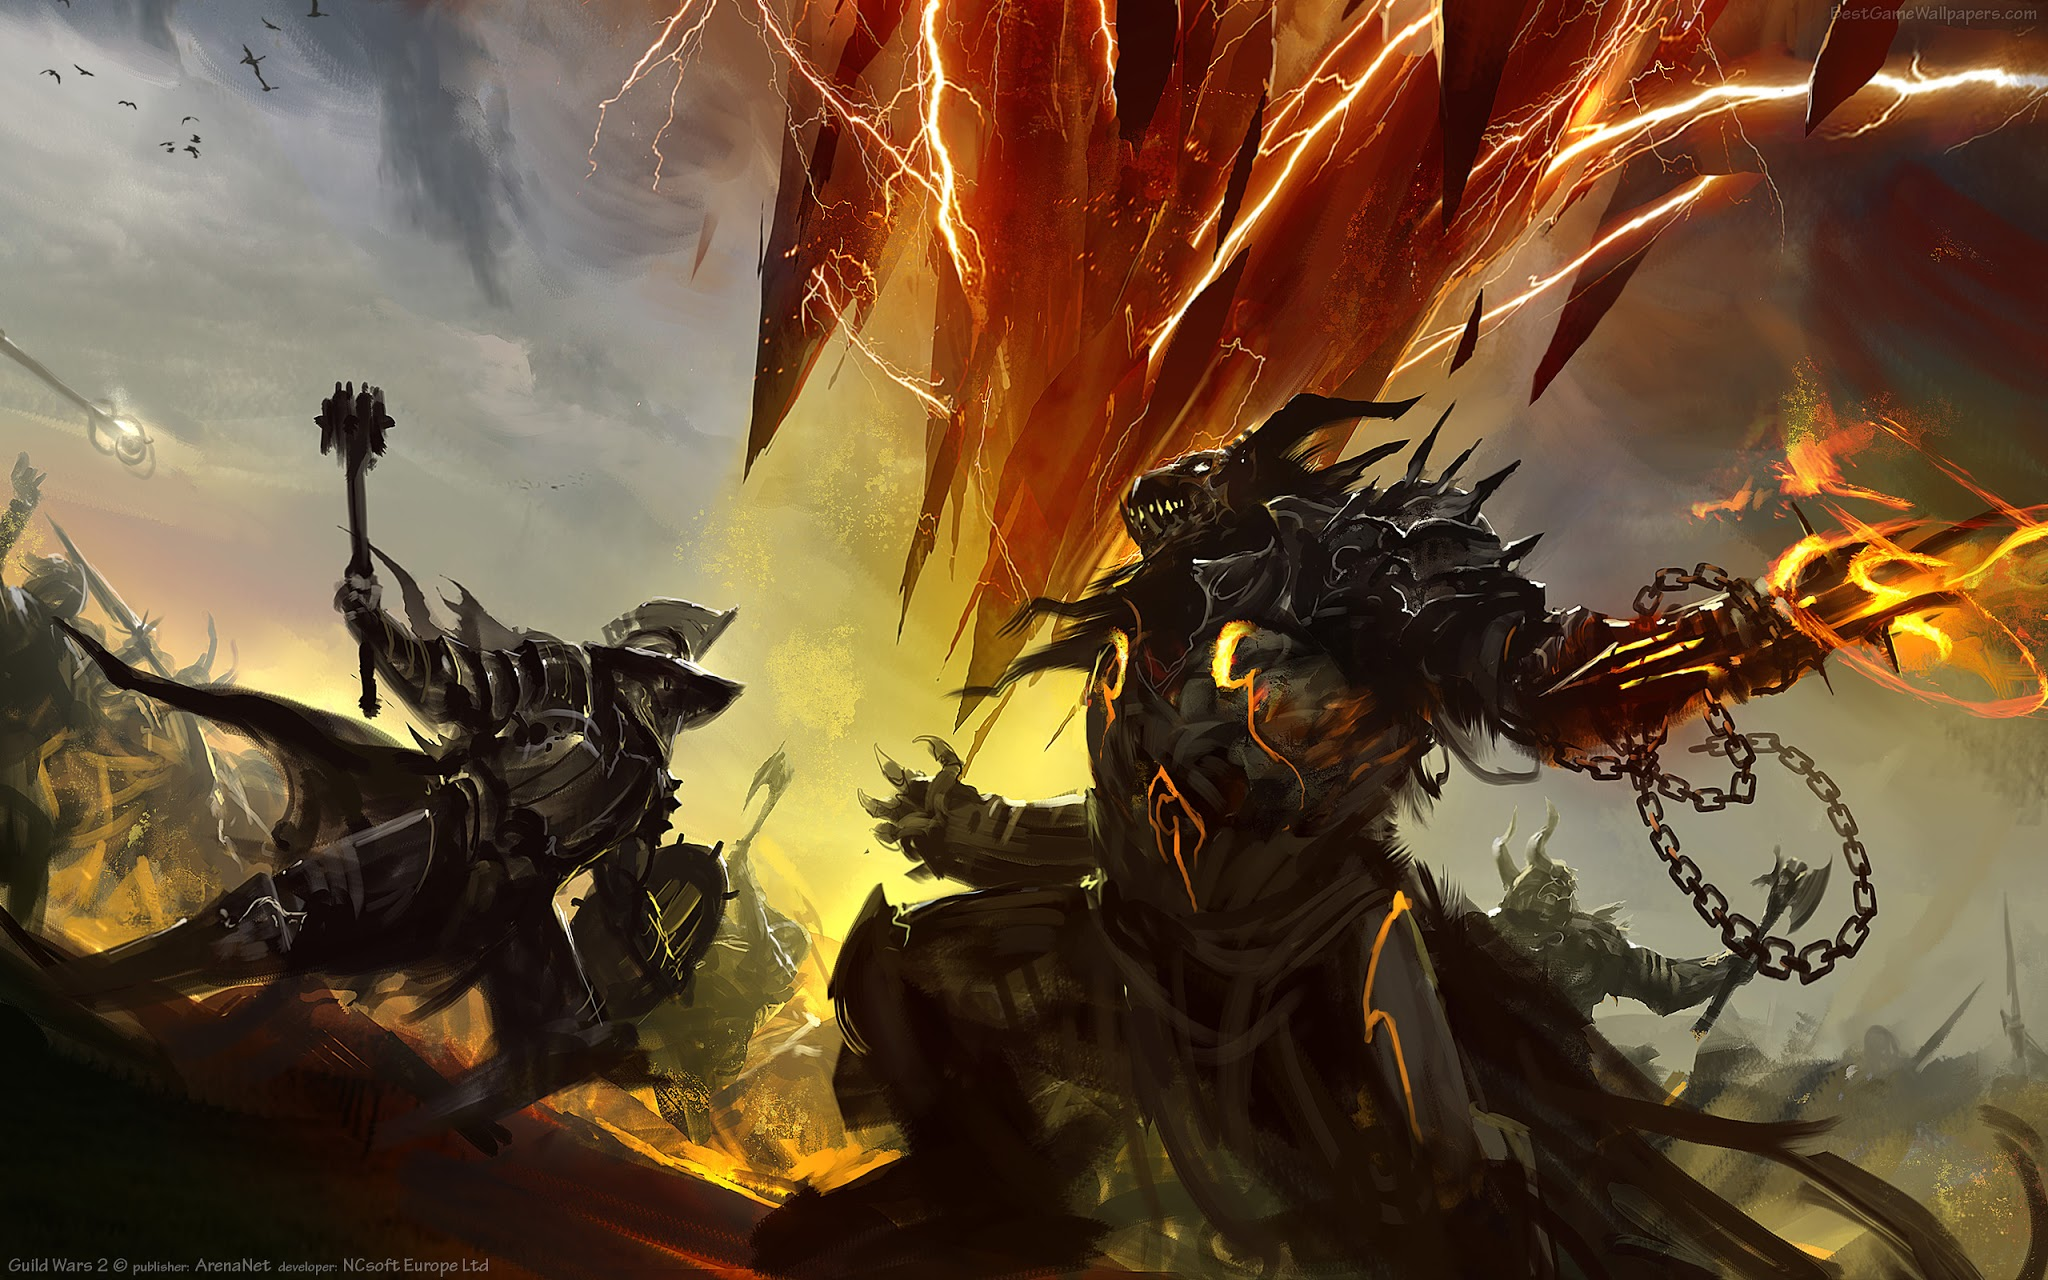 Epic Battle Knight Beast Weapons A77 HD Wallpaper